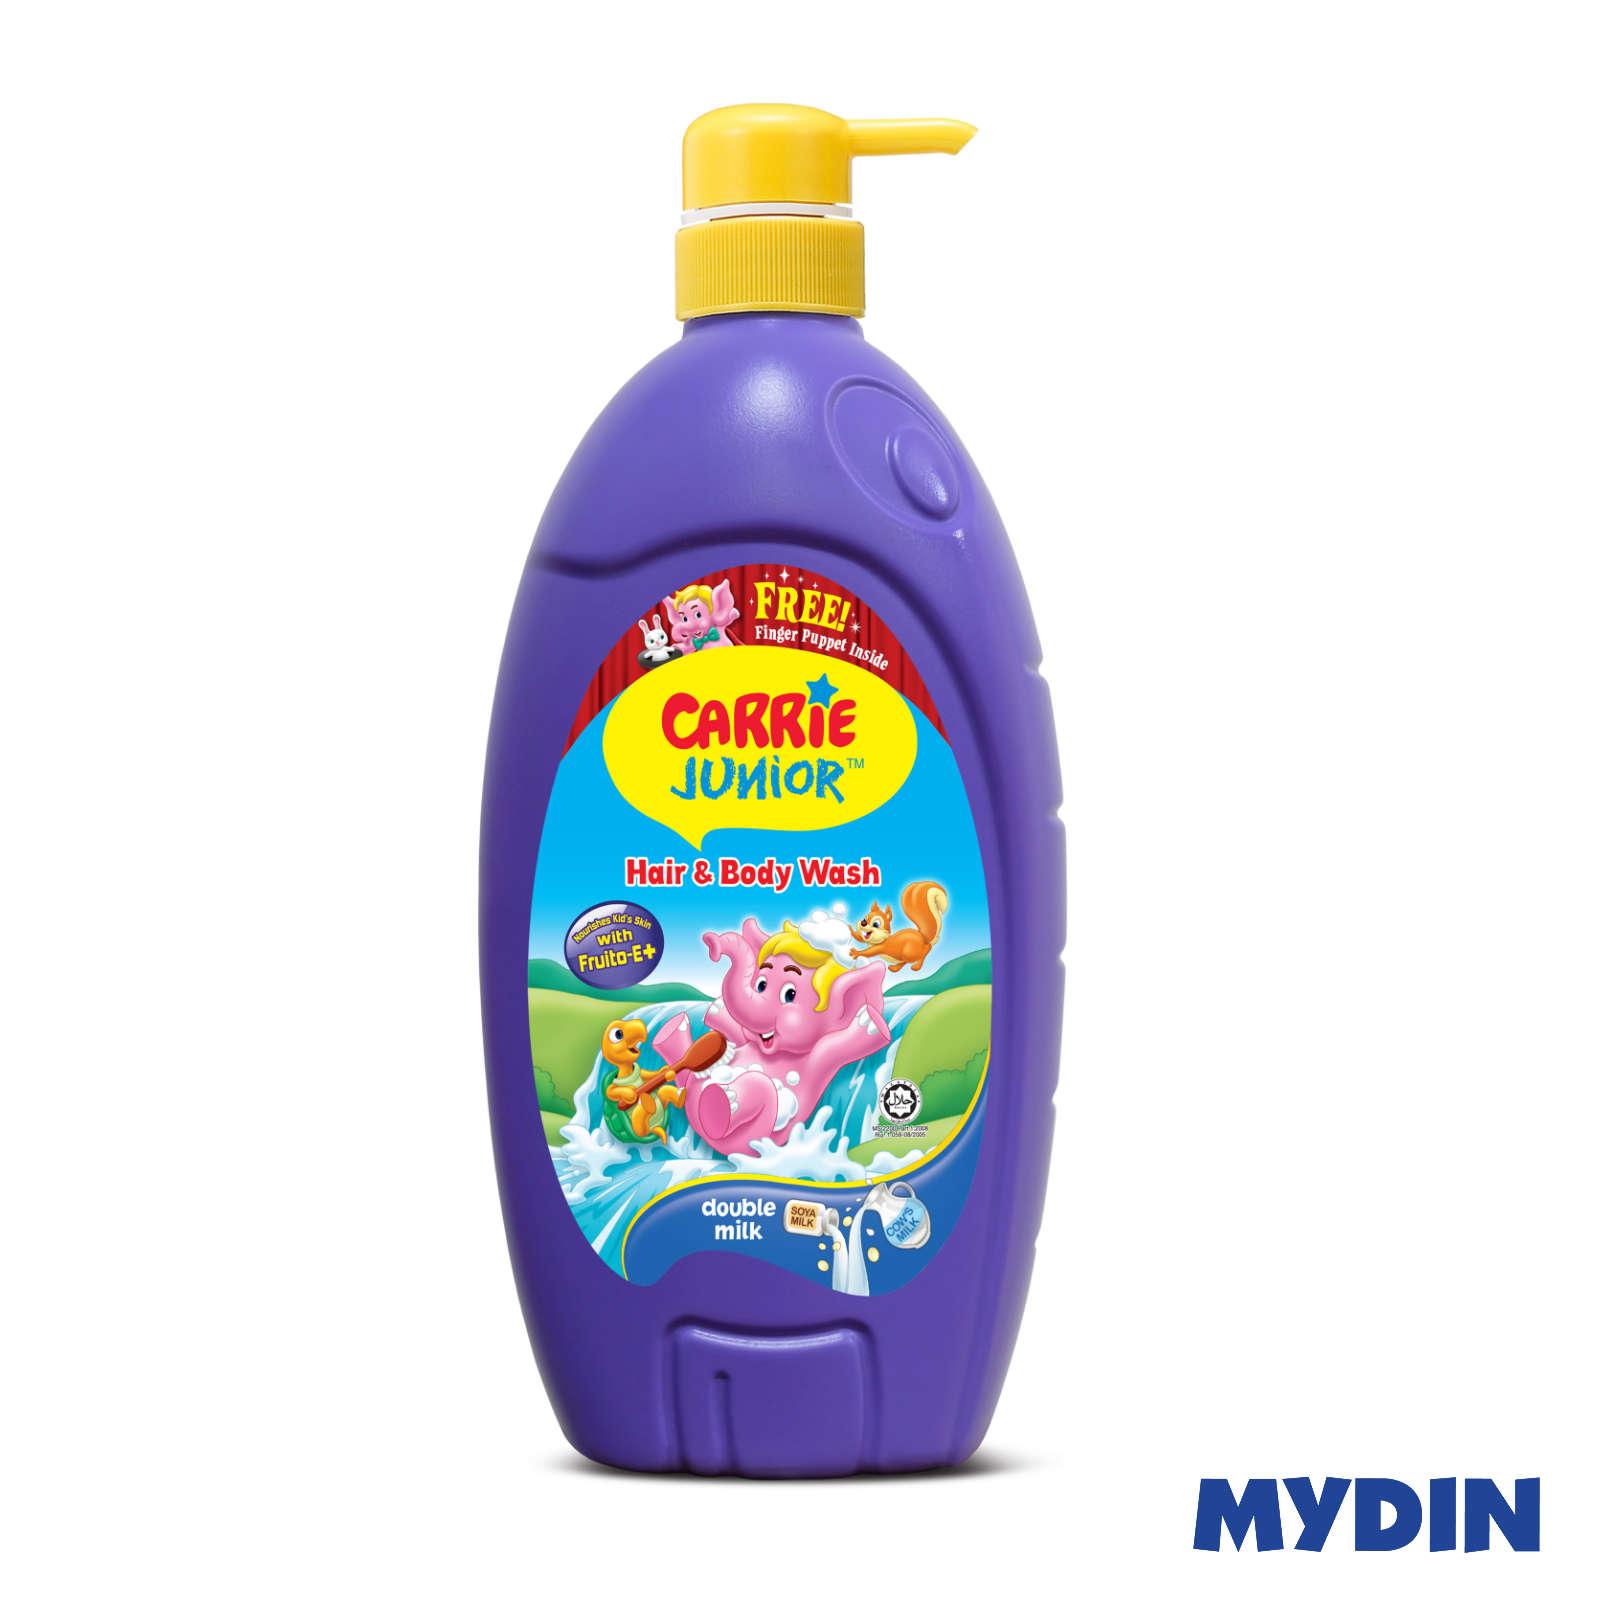 Carrie Junior Baby Hair & Body Wash Double Milk 1000g